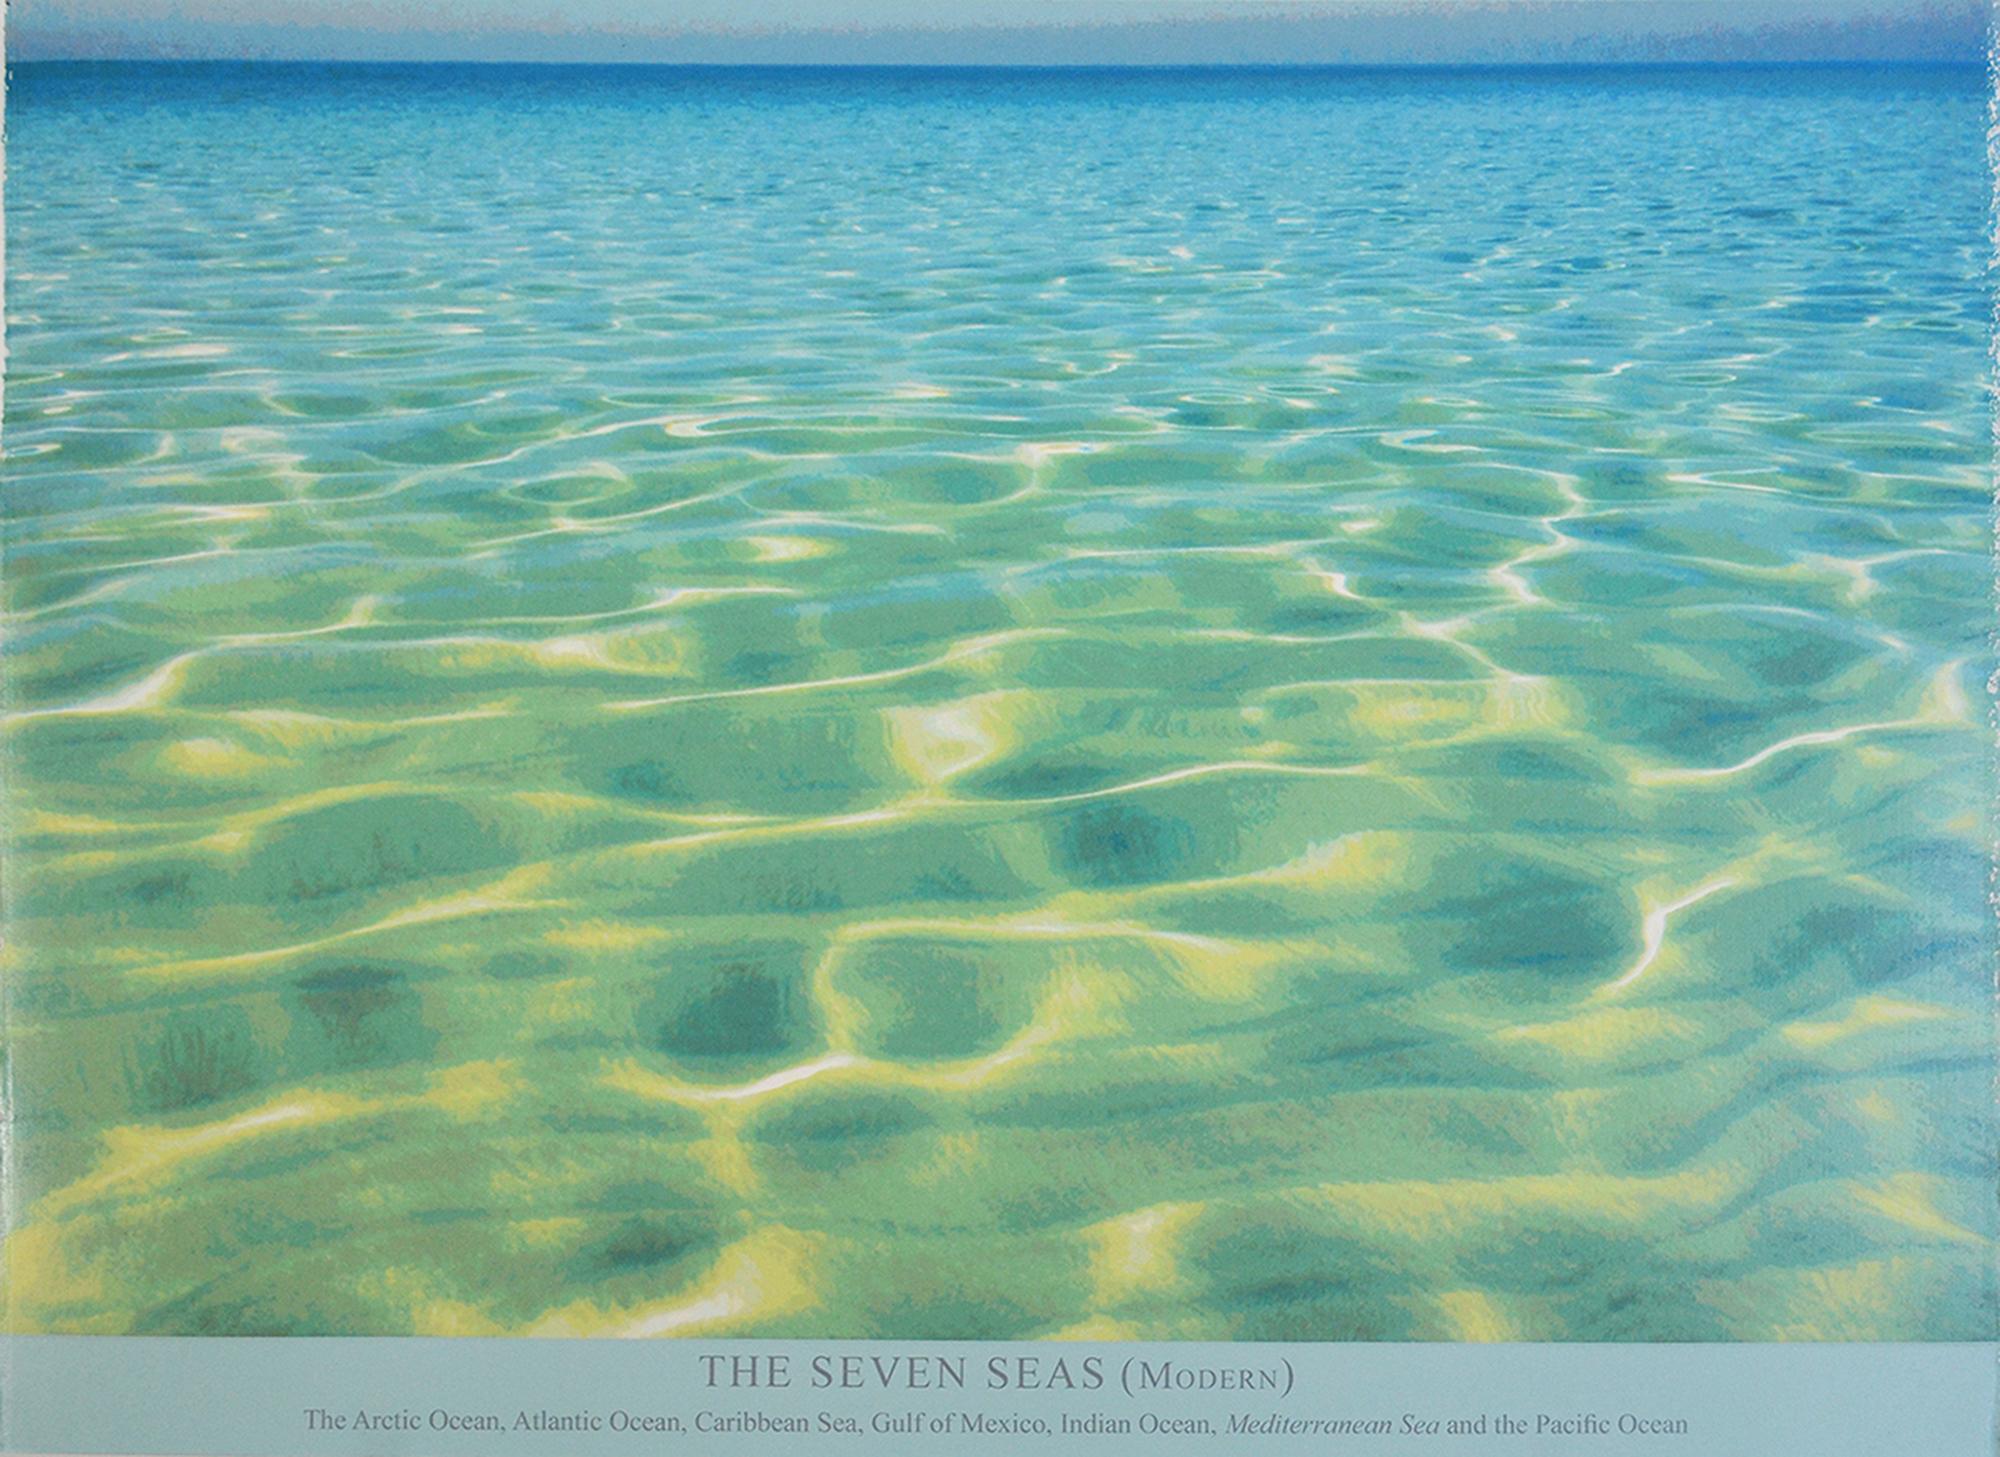 mediterranean sea 300dpi yerevan.jpg